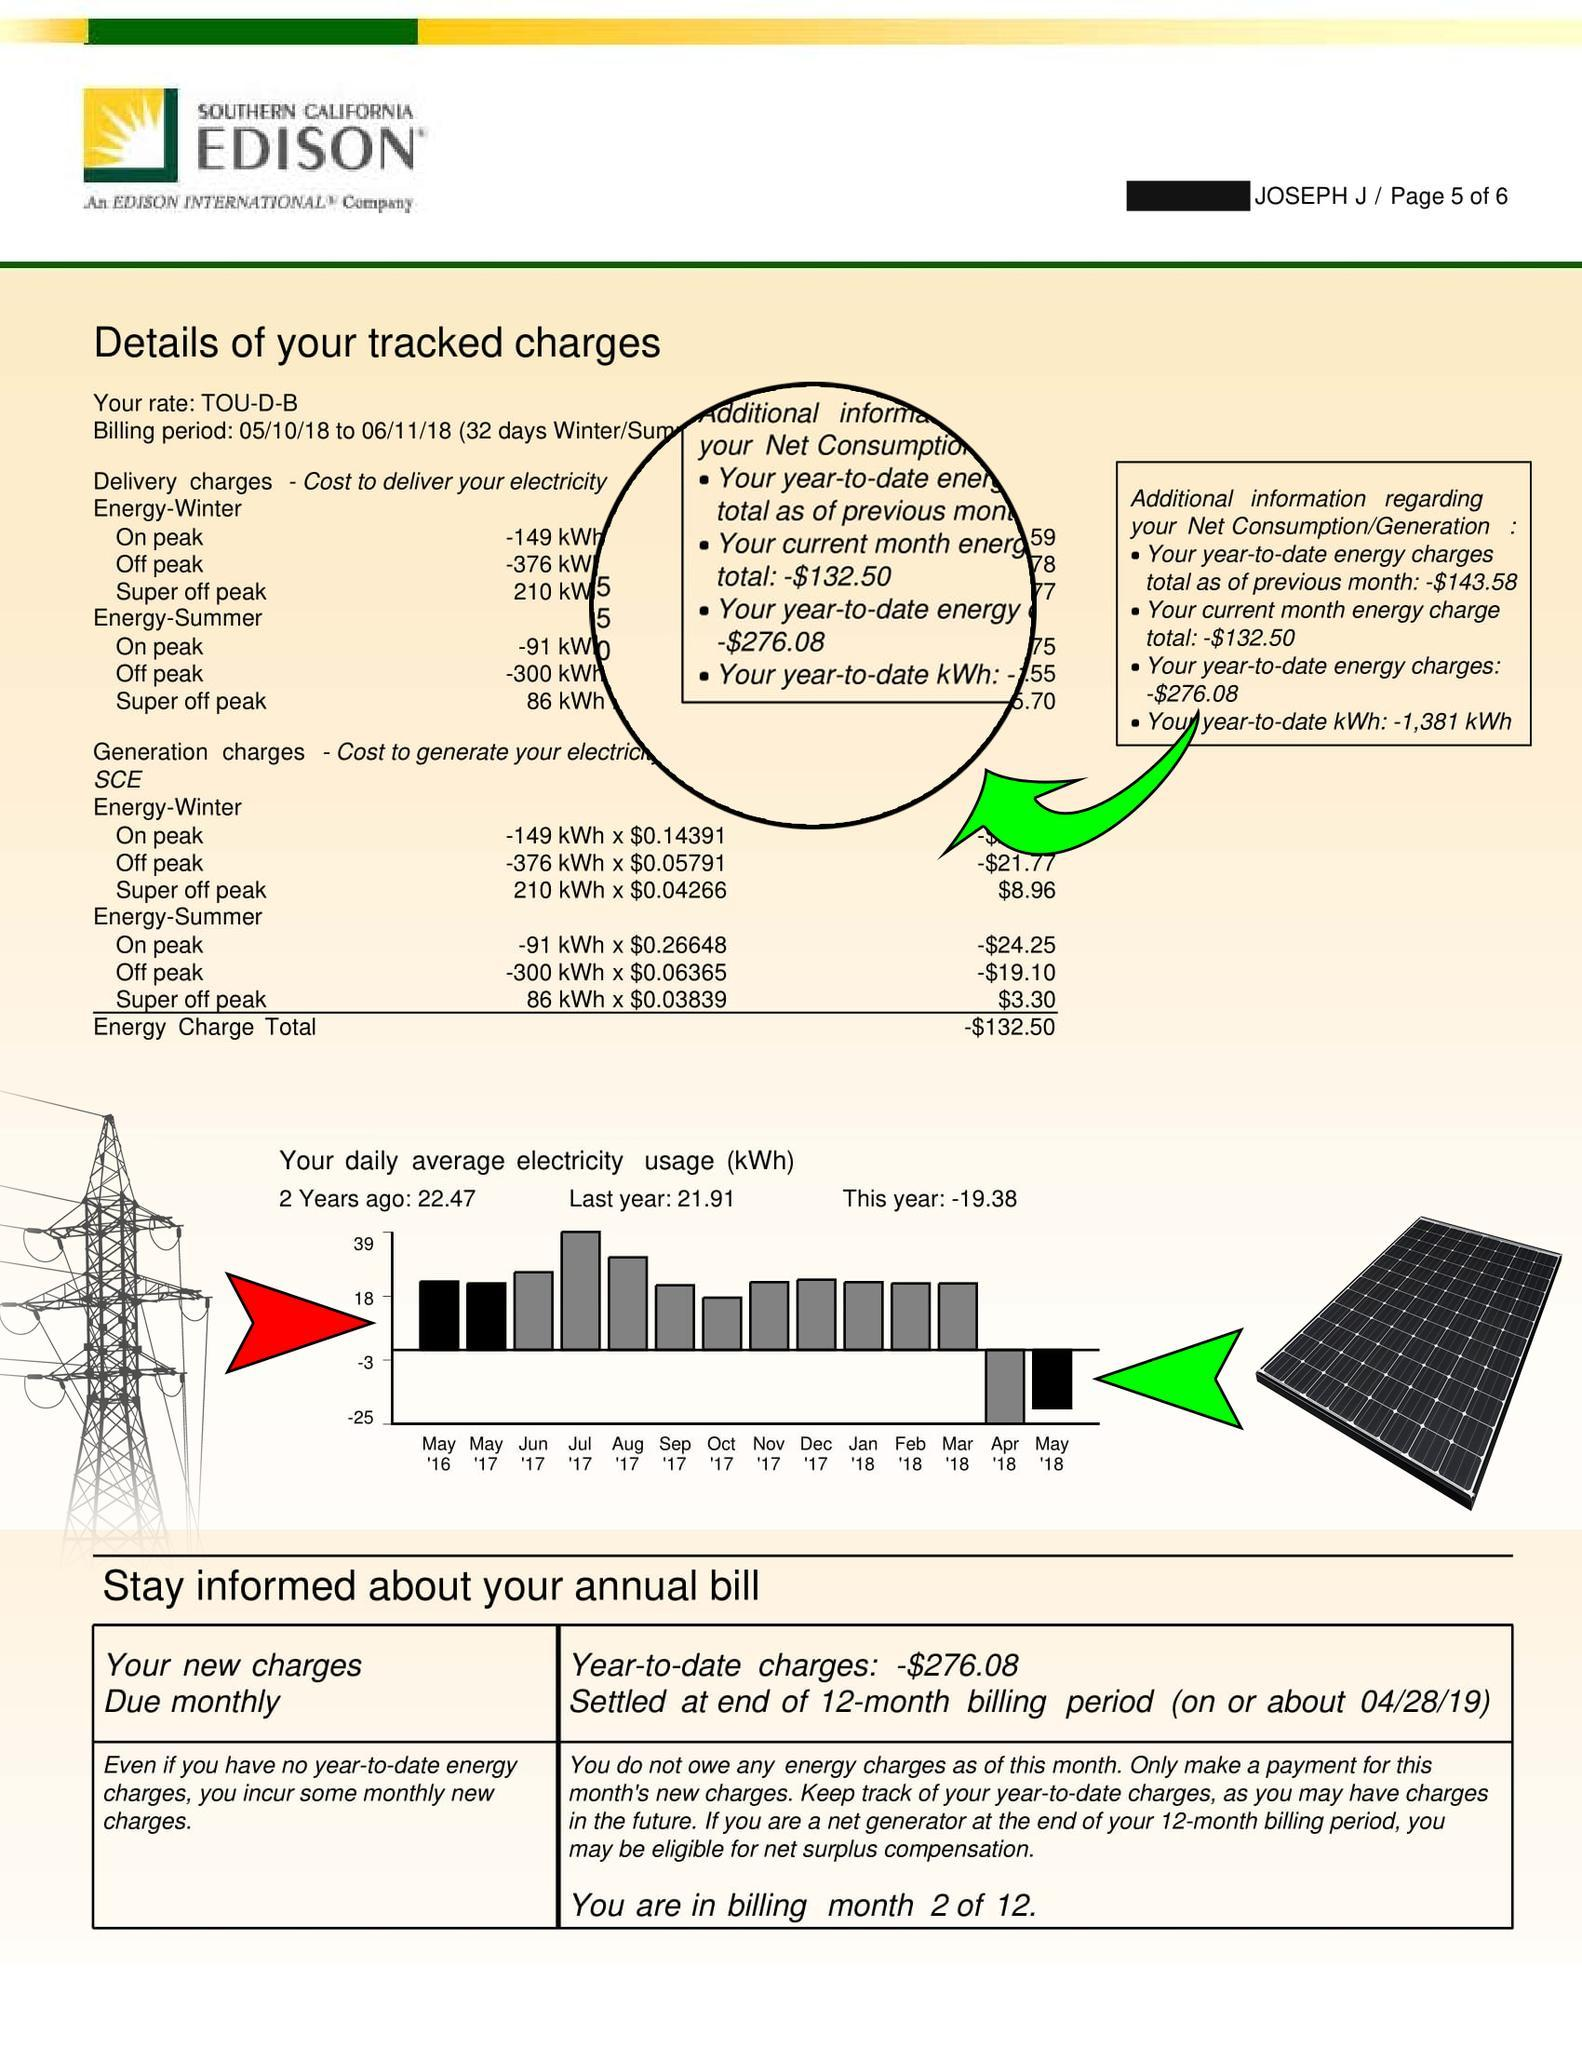 Artgreen Solar Profile And Reviews 2019 Energysage